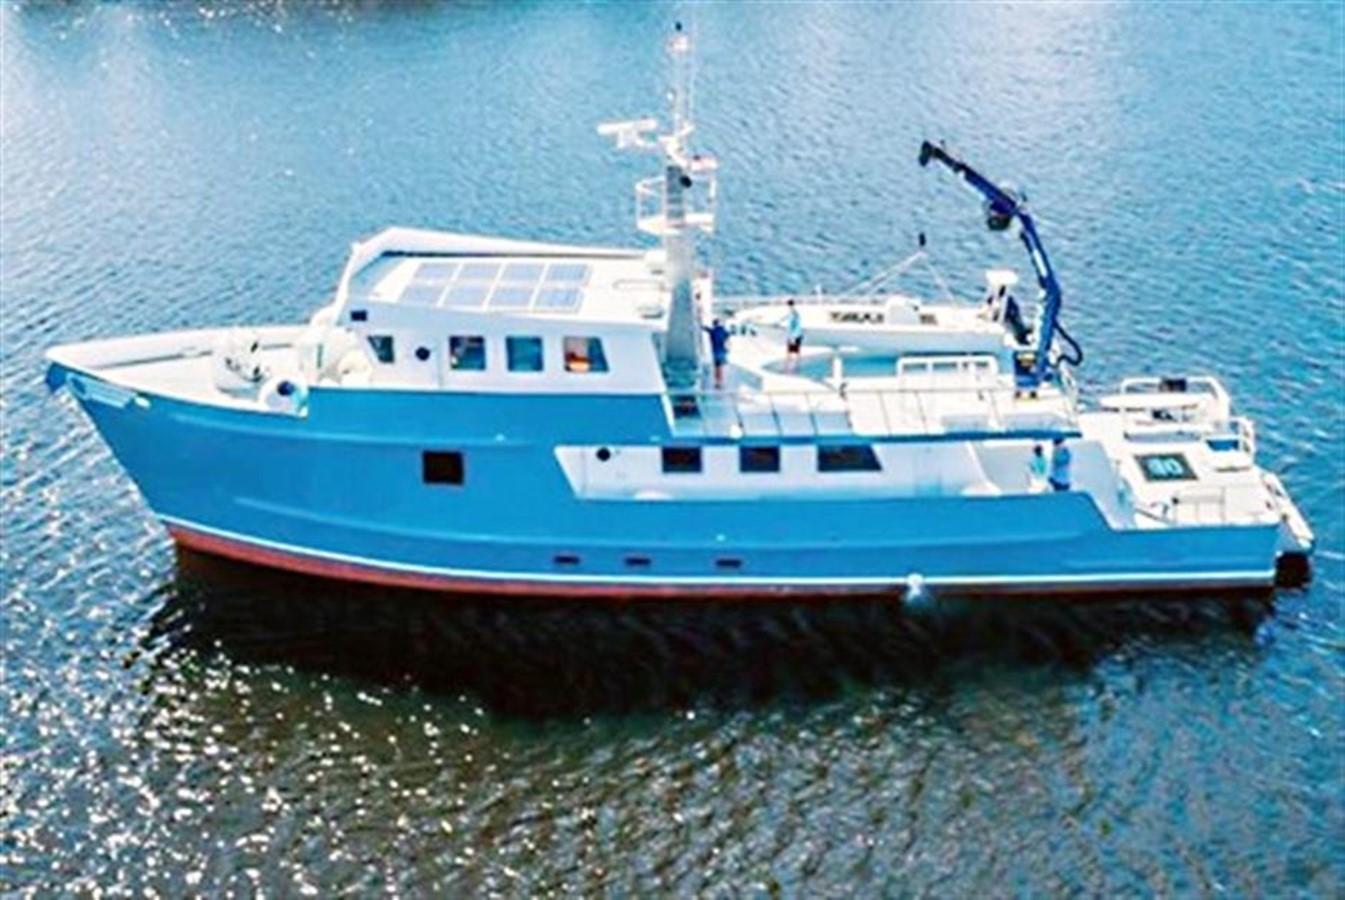 2013 OCEAN VOYAGER  For Sale